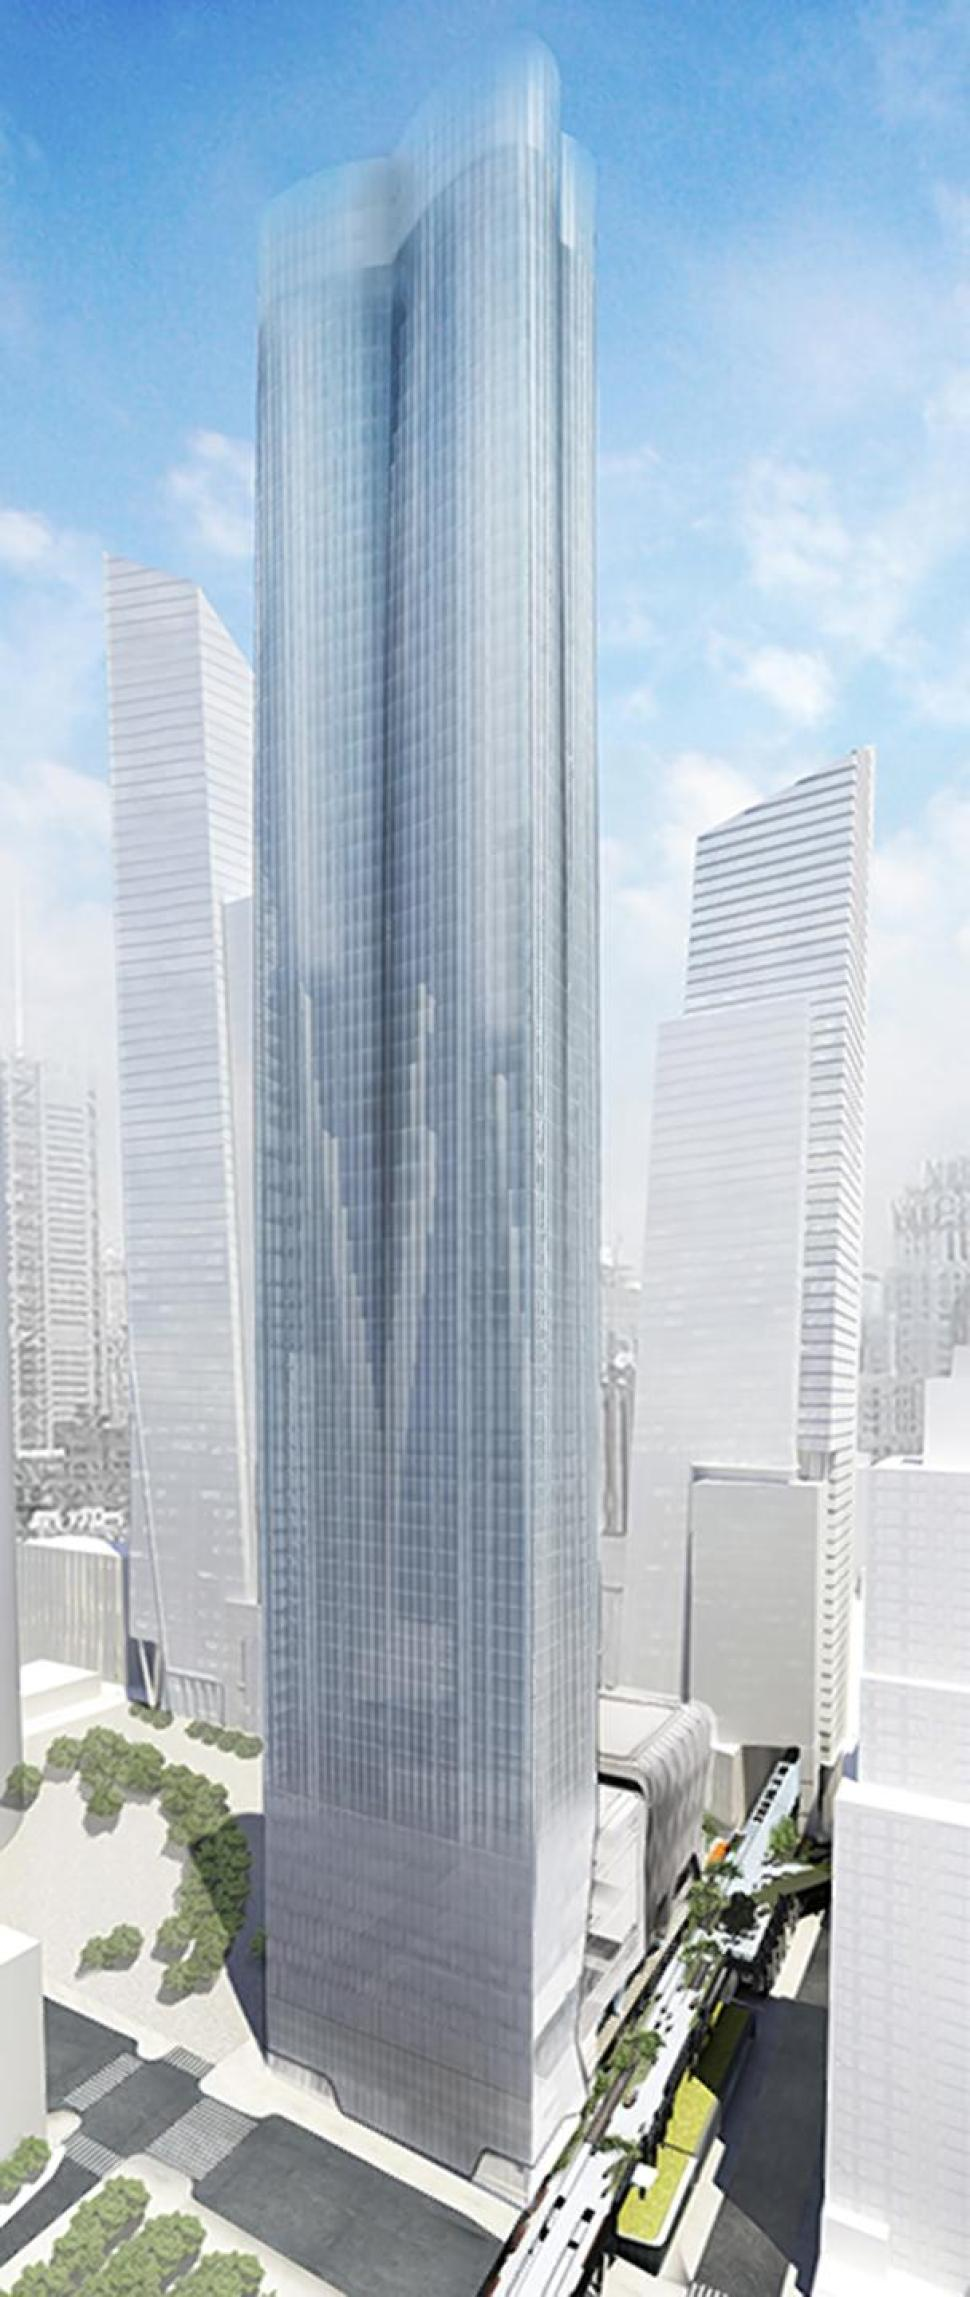 15 Hudson Yards, rendering by Diller Scofidio + Renfro